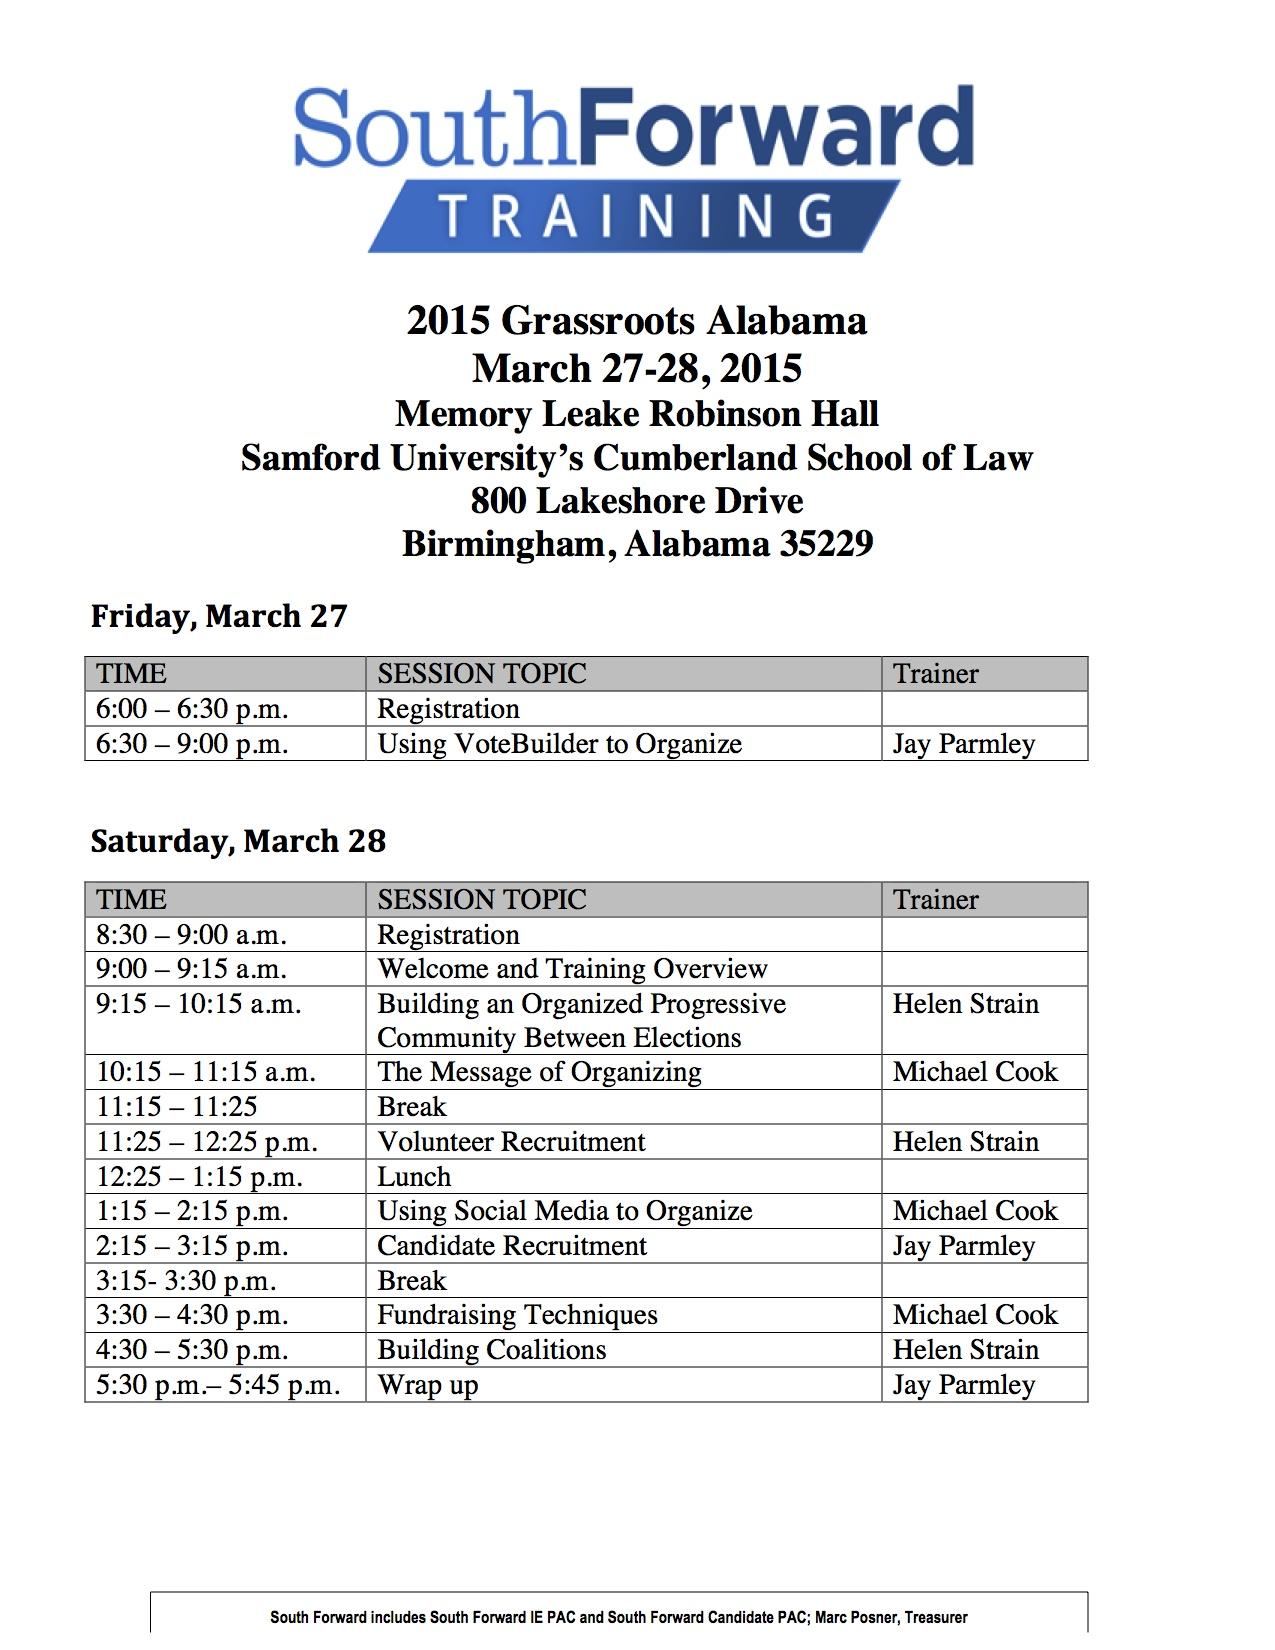 AL_Training_Draft_Agenda.jpg